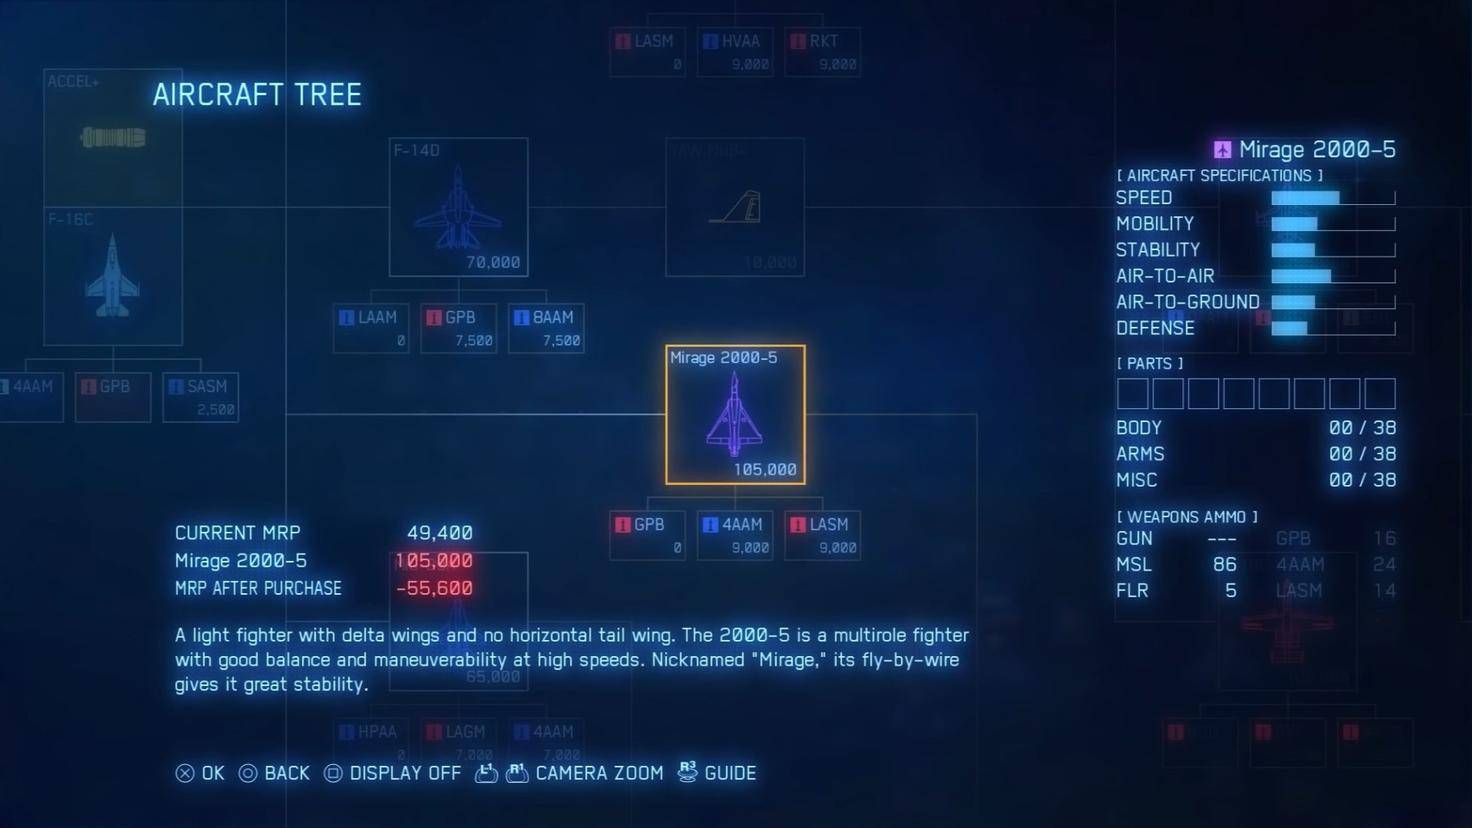 ace-combat-7-ps4-flugzeugschema-screenshot